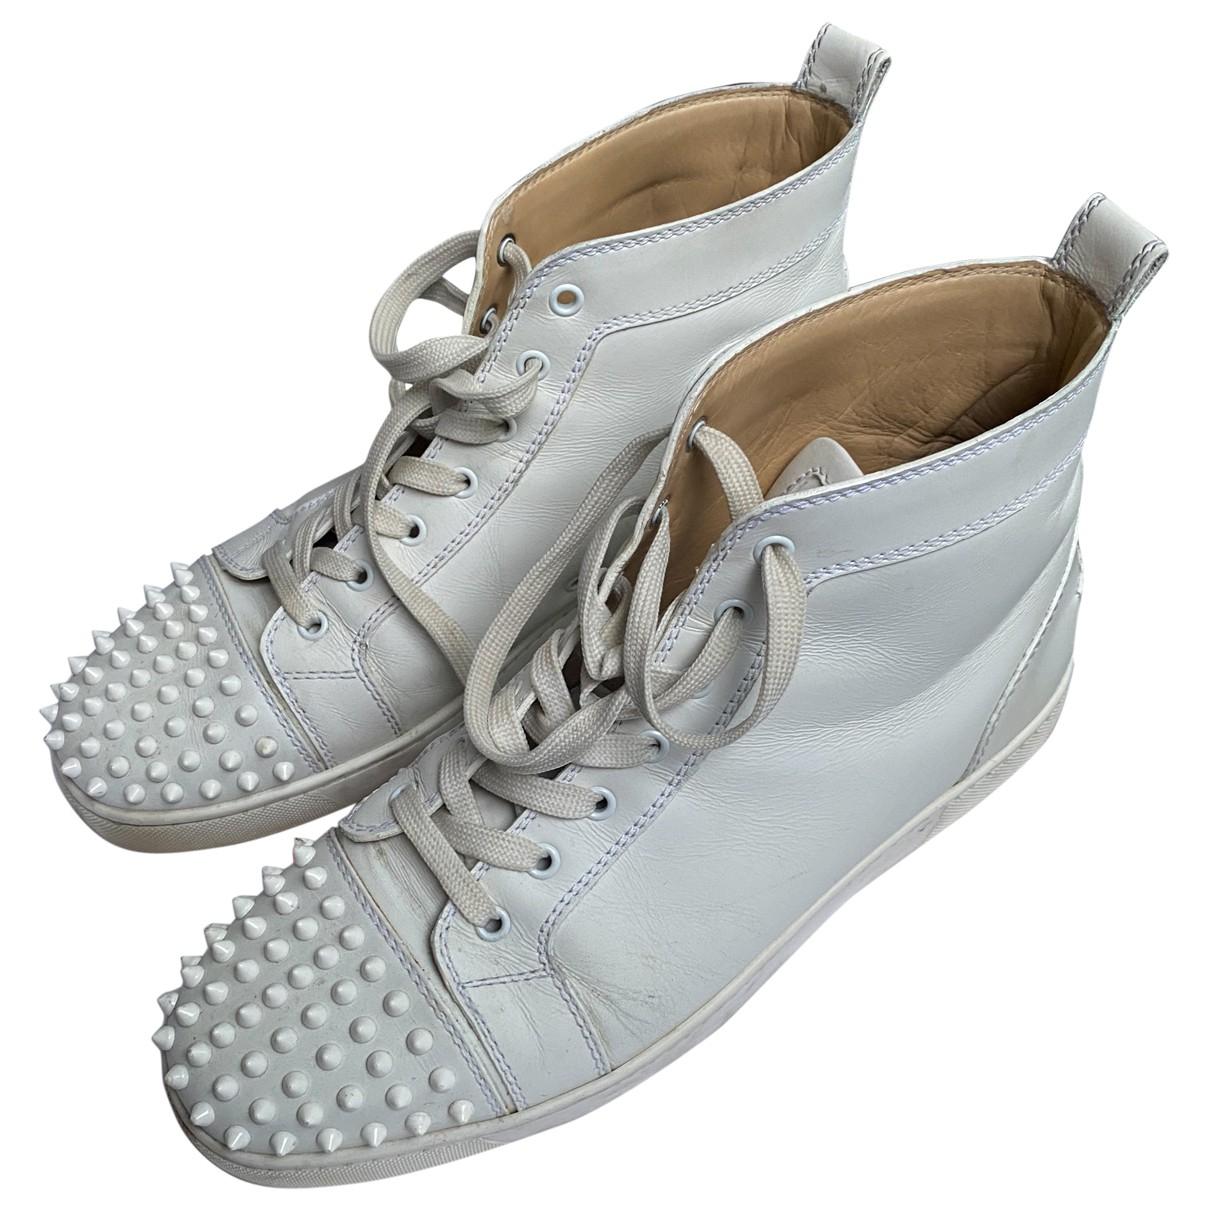 Christian Louboutin Louis Sneakers in  Weiss Leder